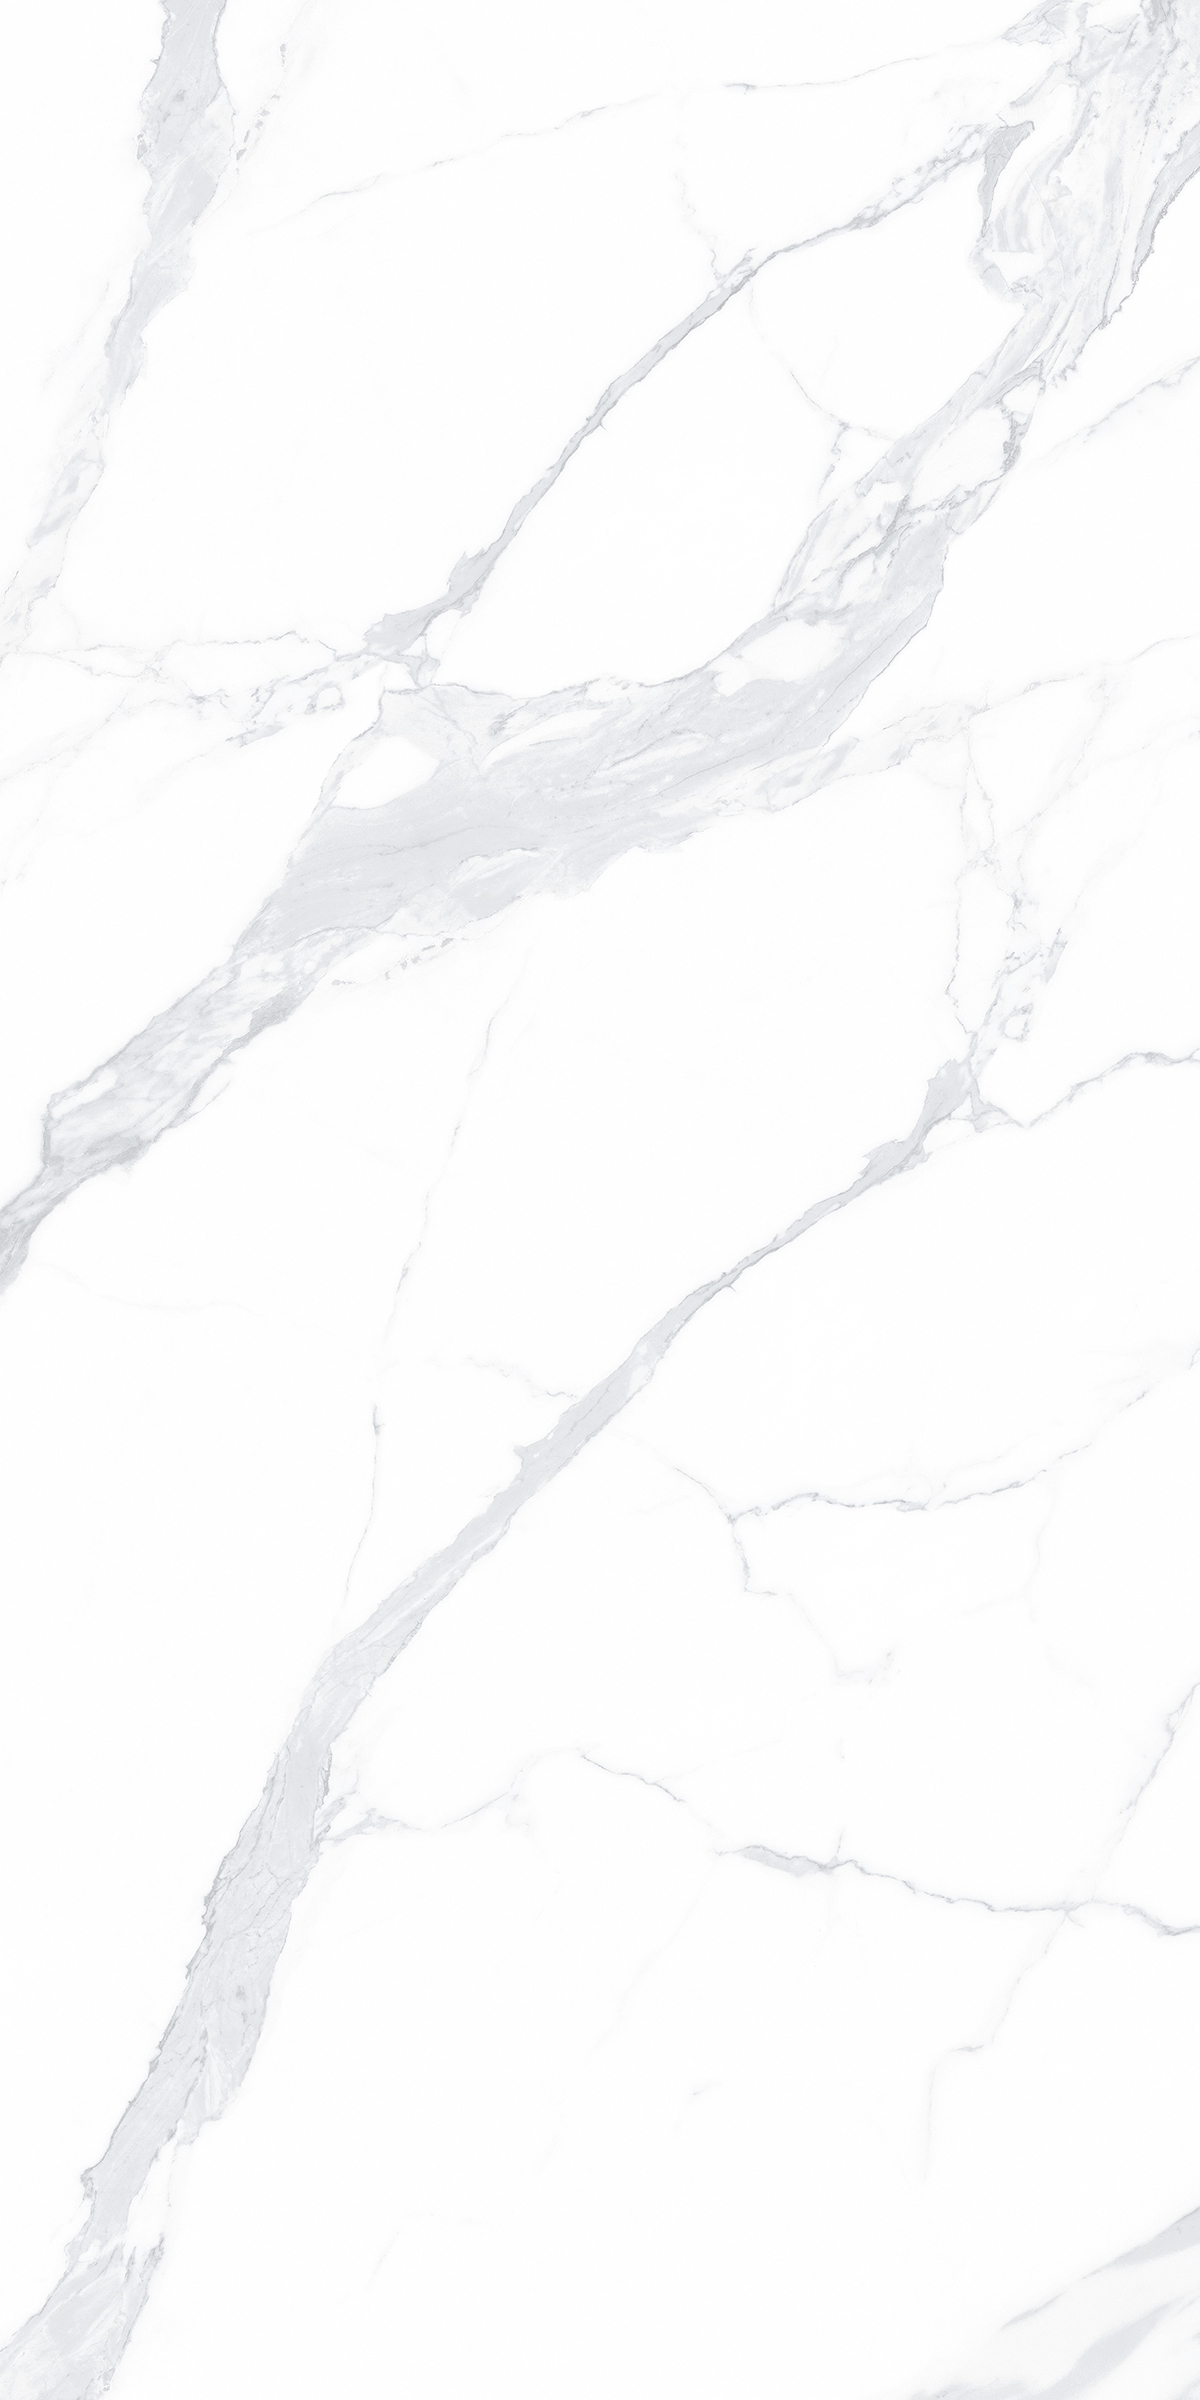 T18951 阿尔卑斯白